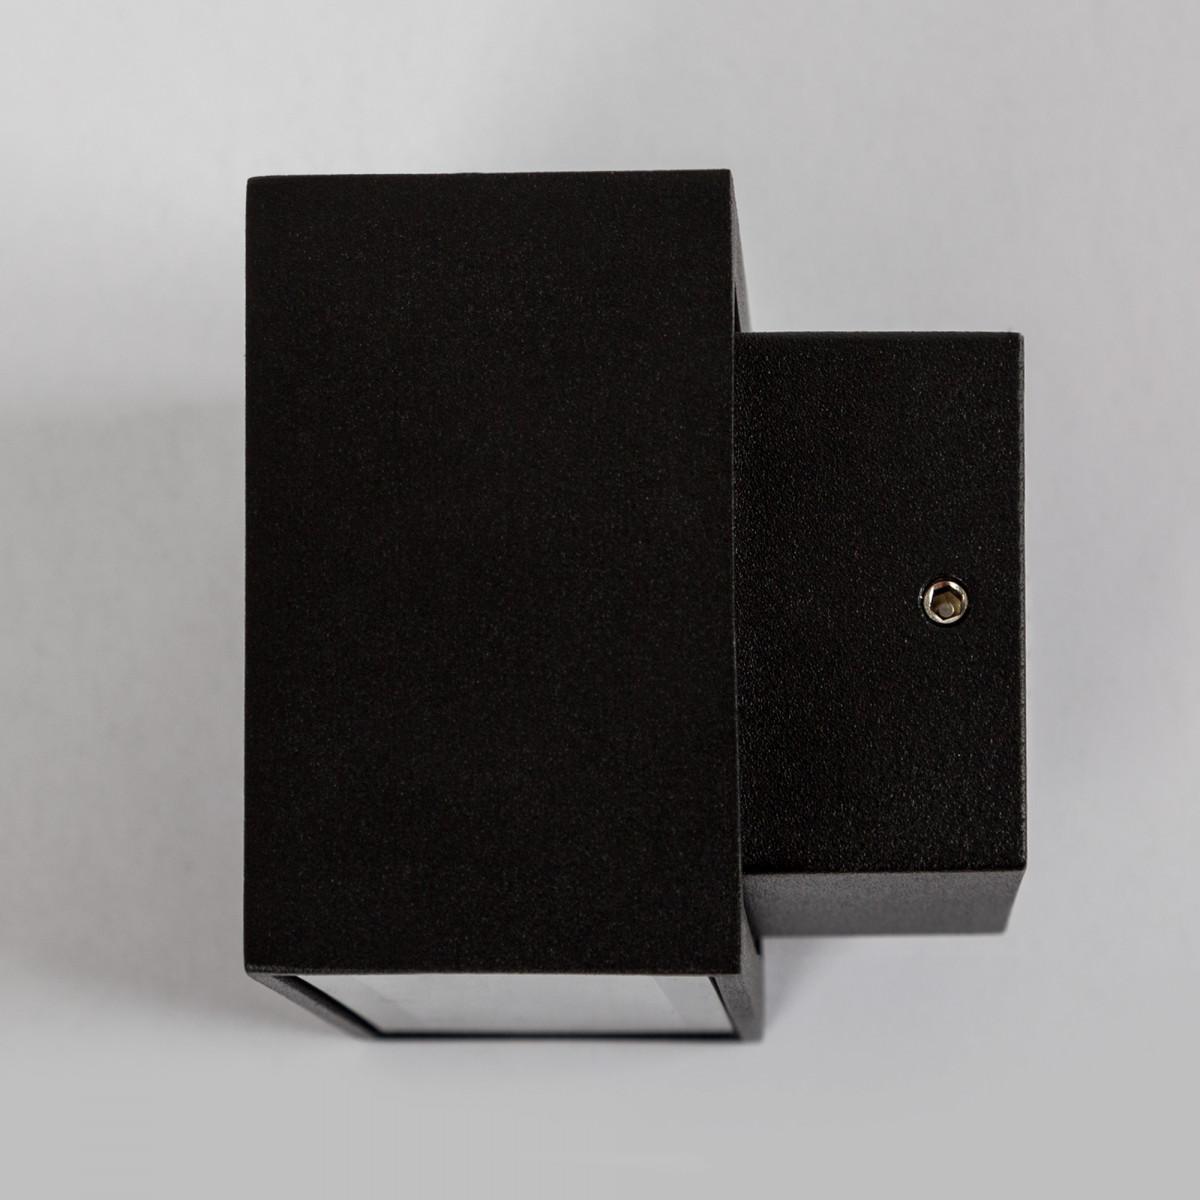 Gevelspot Segment Small led een compacte square aluminium LED wandspot up down kleur zwart, weerbestendige duurzame buitenverlichting merk KS Verlichting